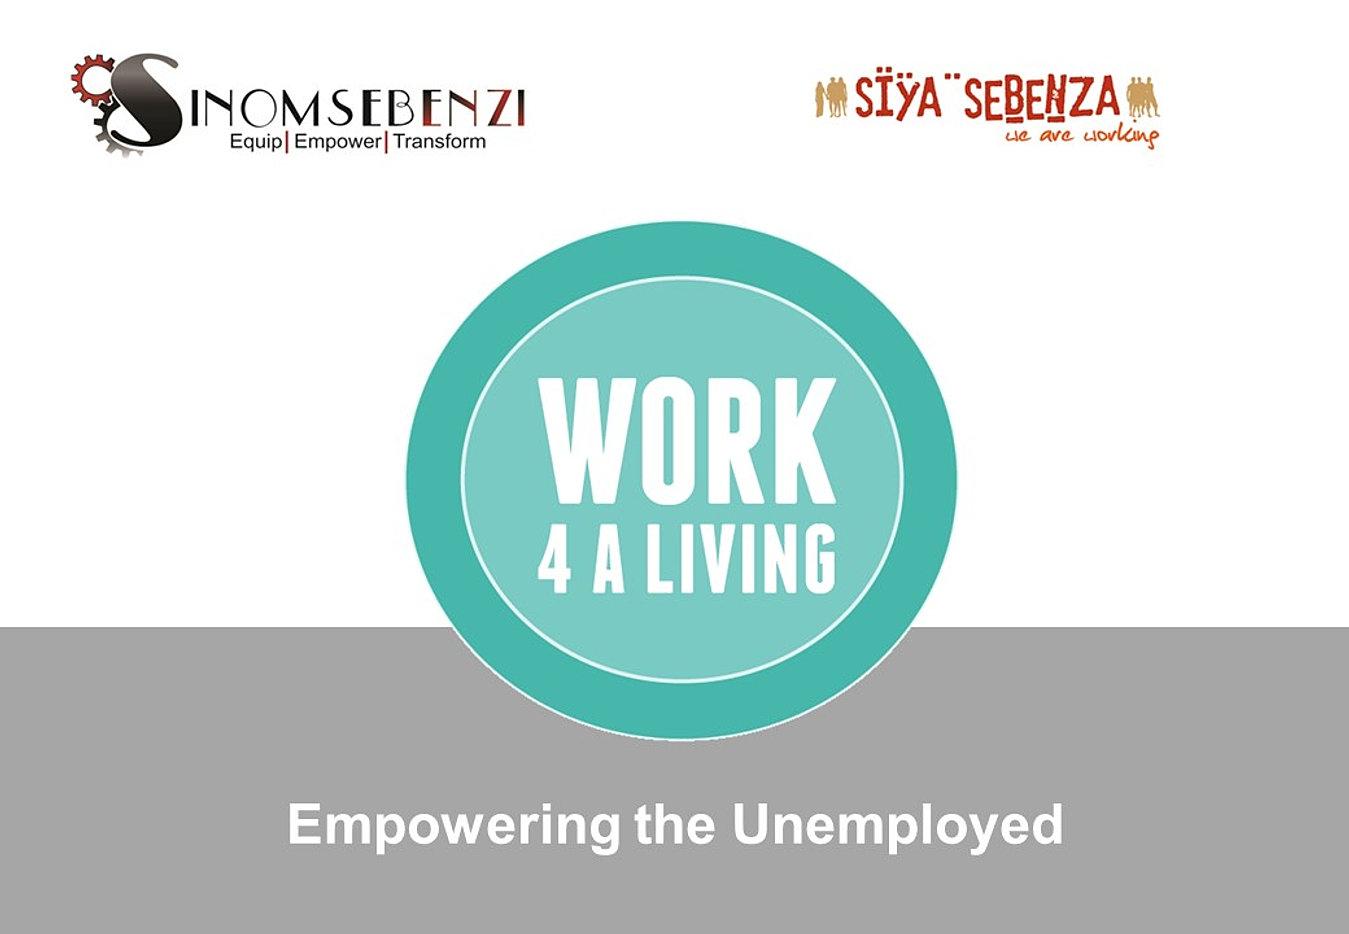 sinomsebenzibd   Work4ALiving - Job Seeking Skills